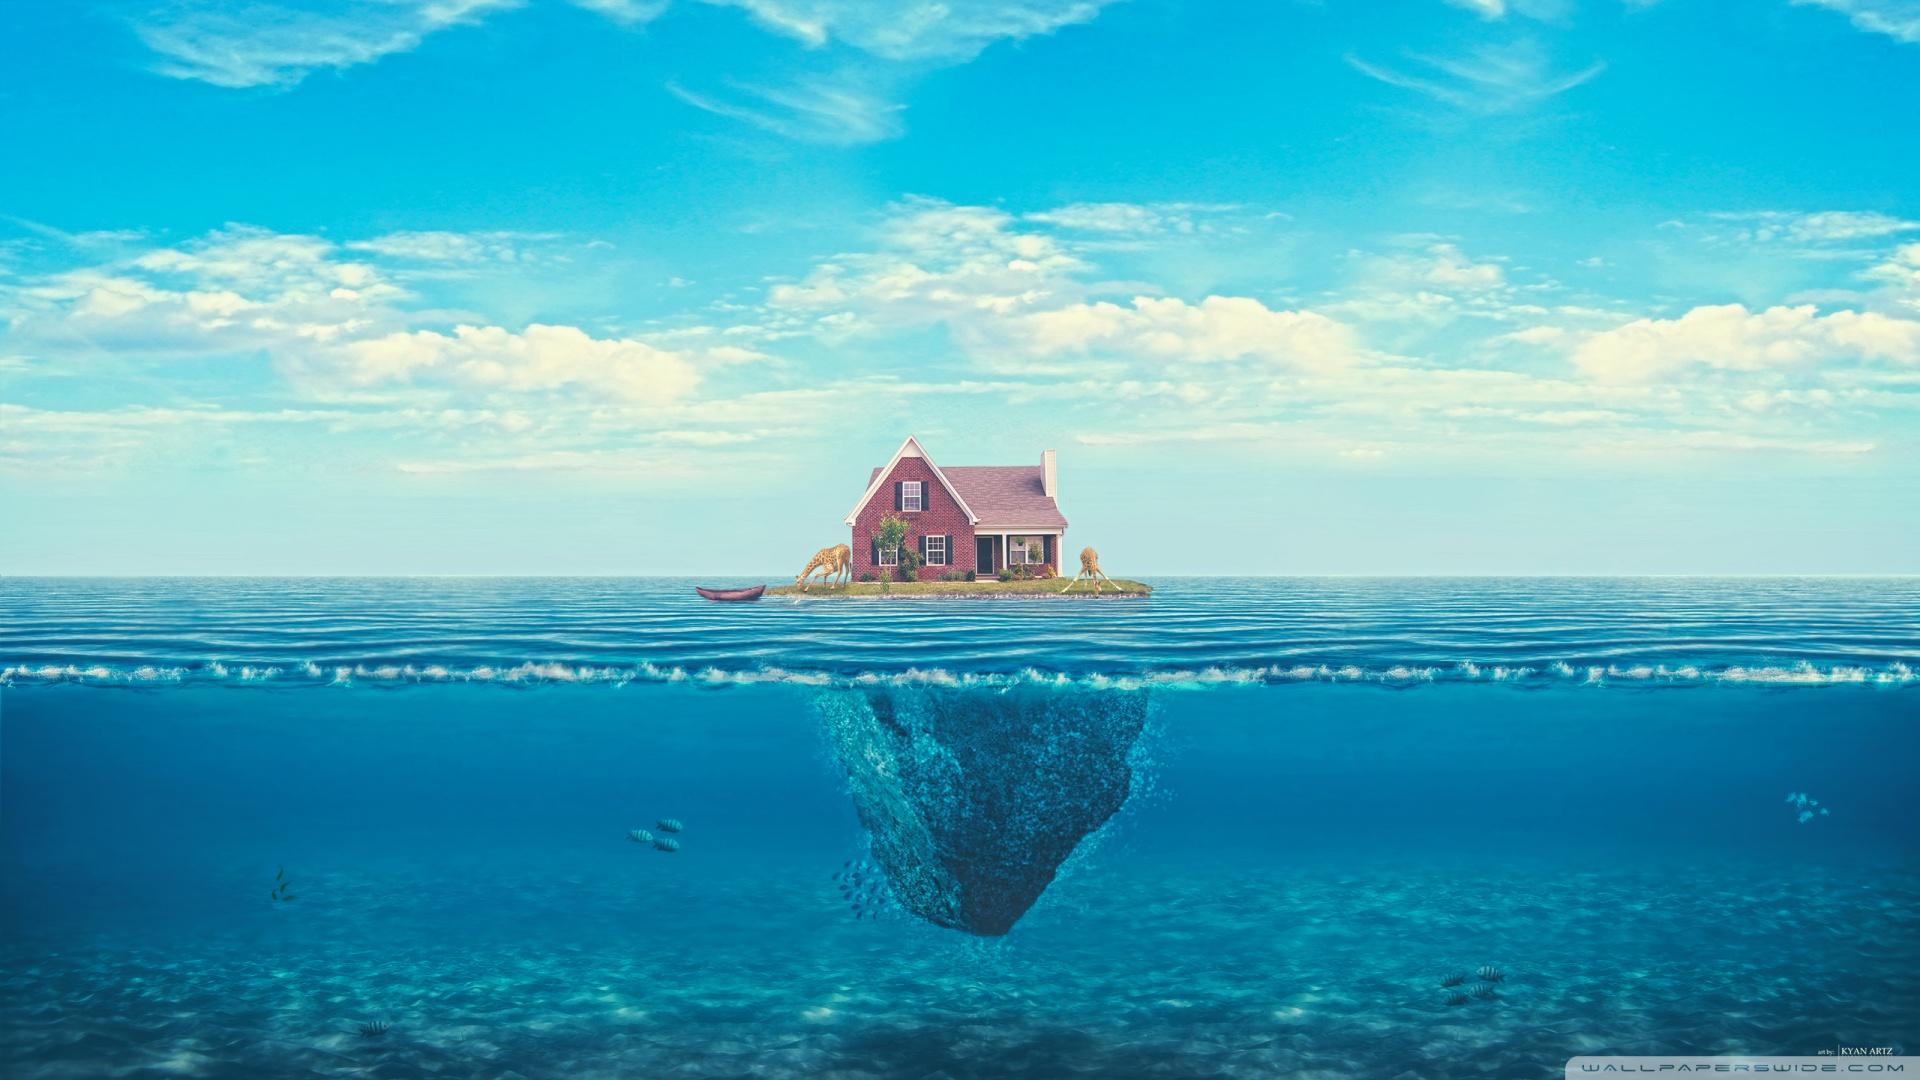 house_on_the_ocean-wallpaper-1920x1080